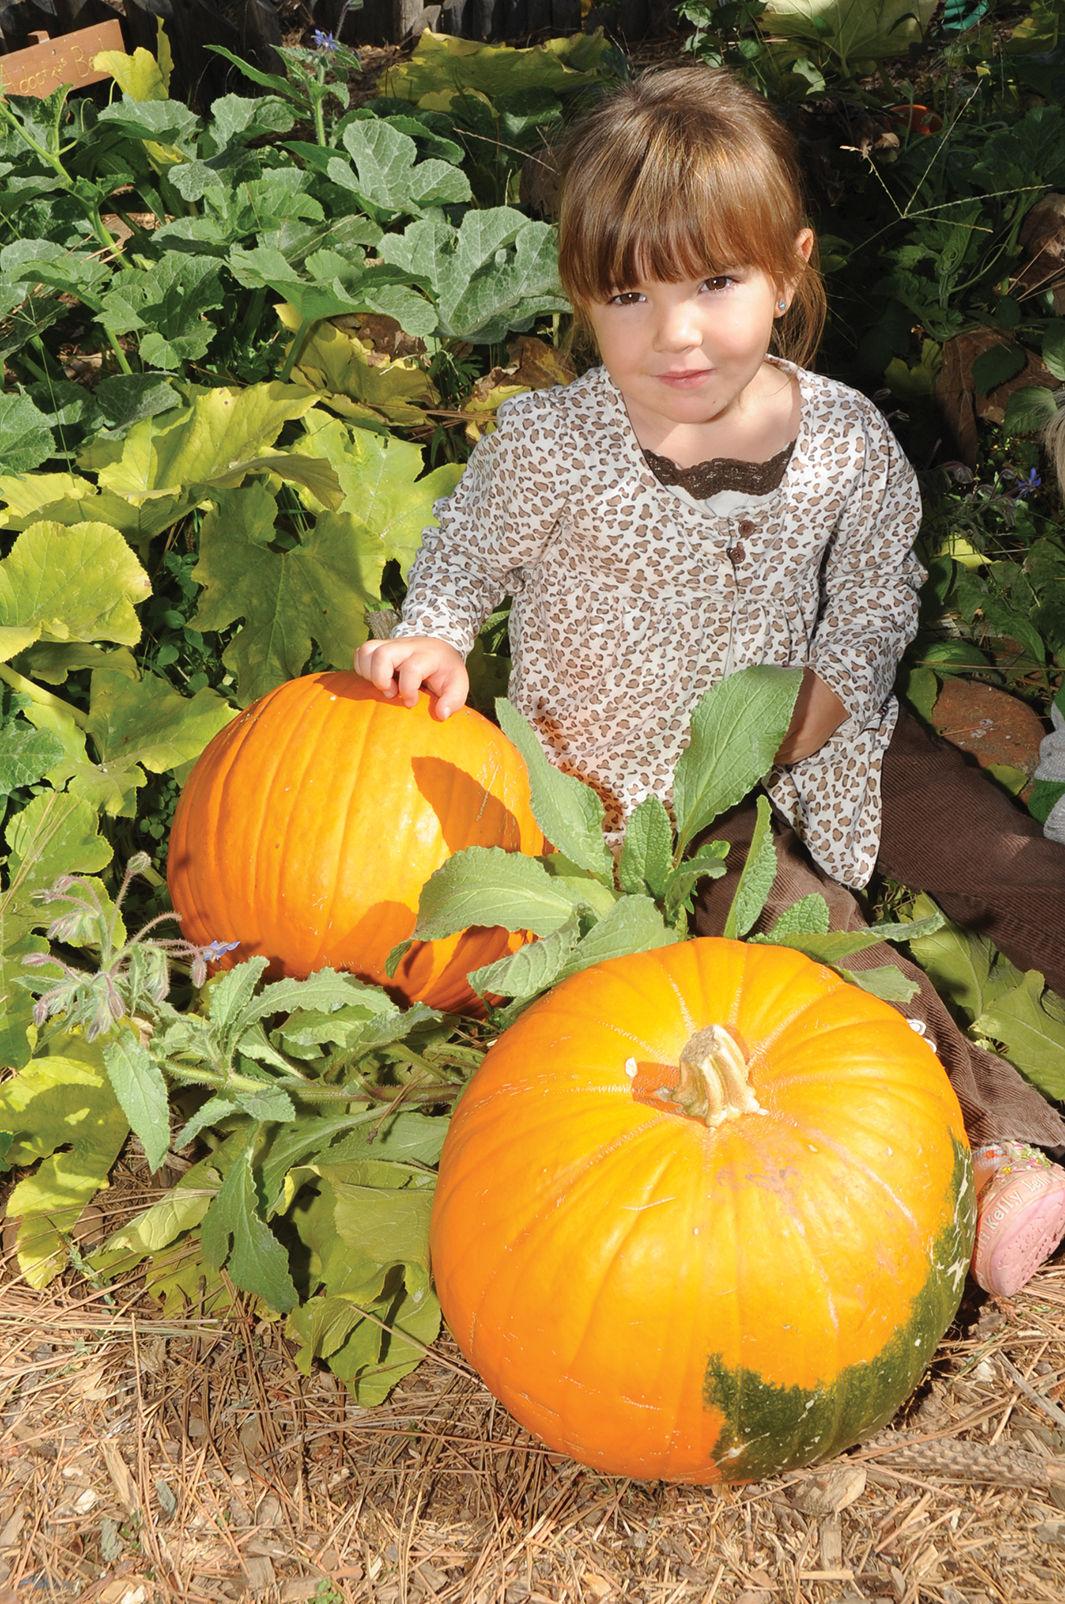 children u0027s garden project u0027s fall pumpkin patch activities games